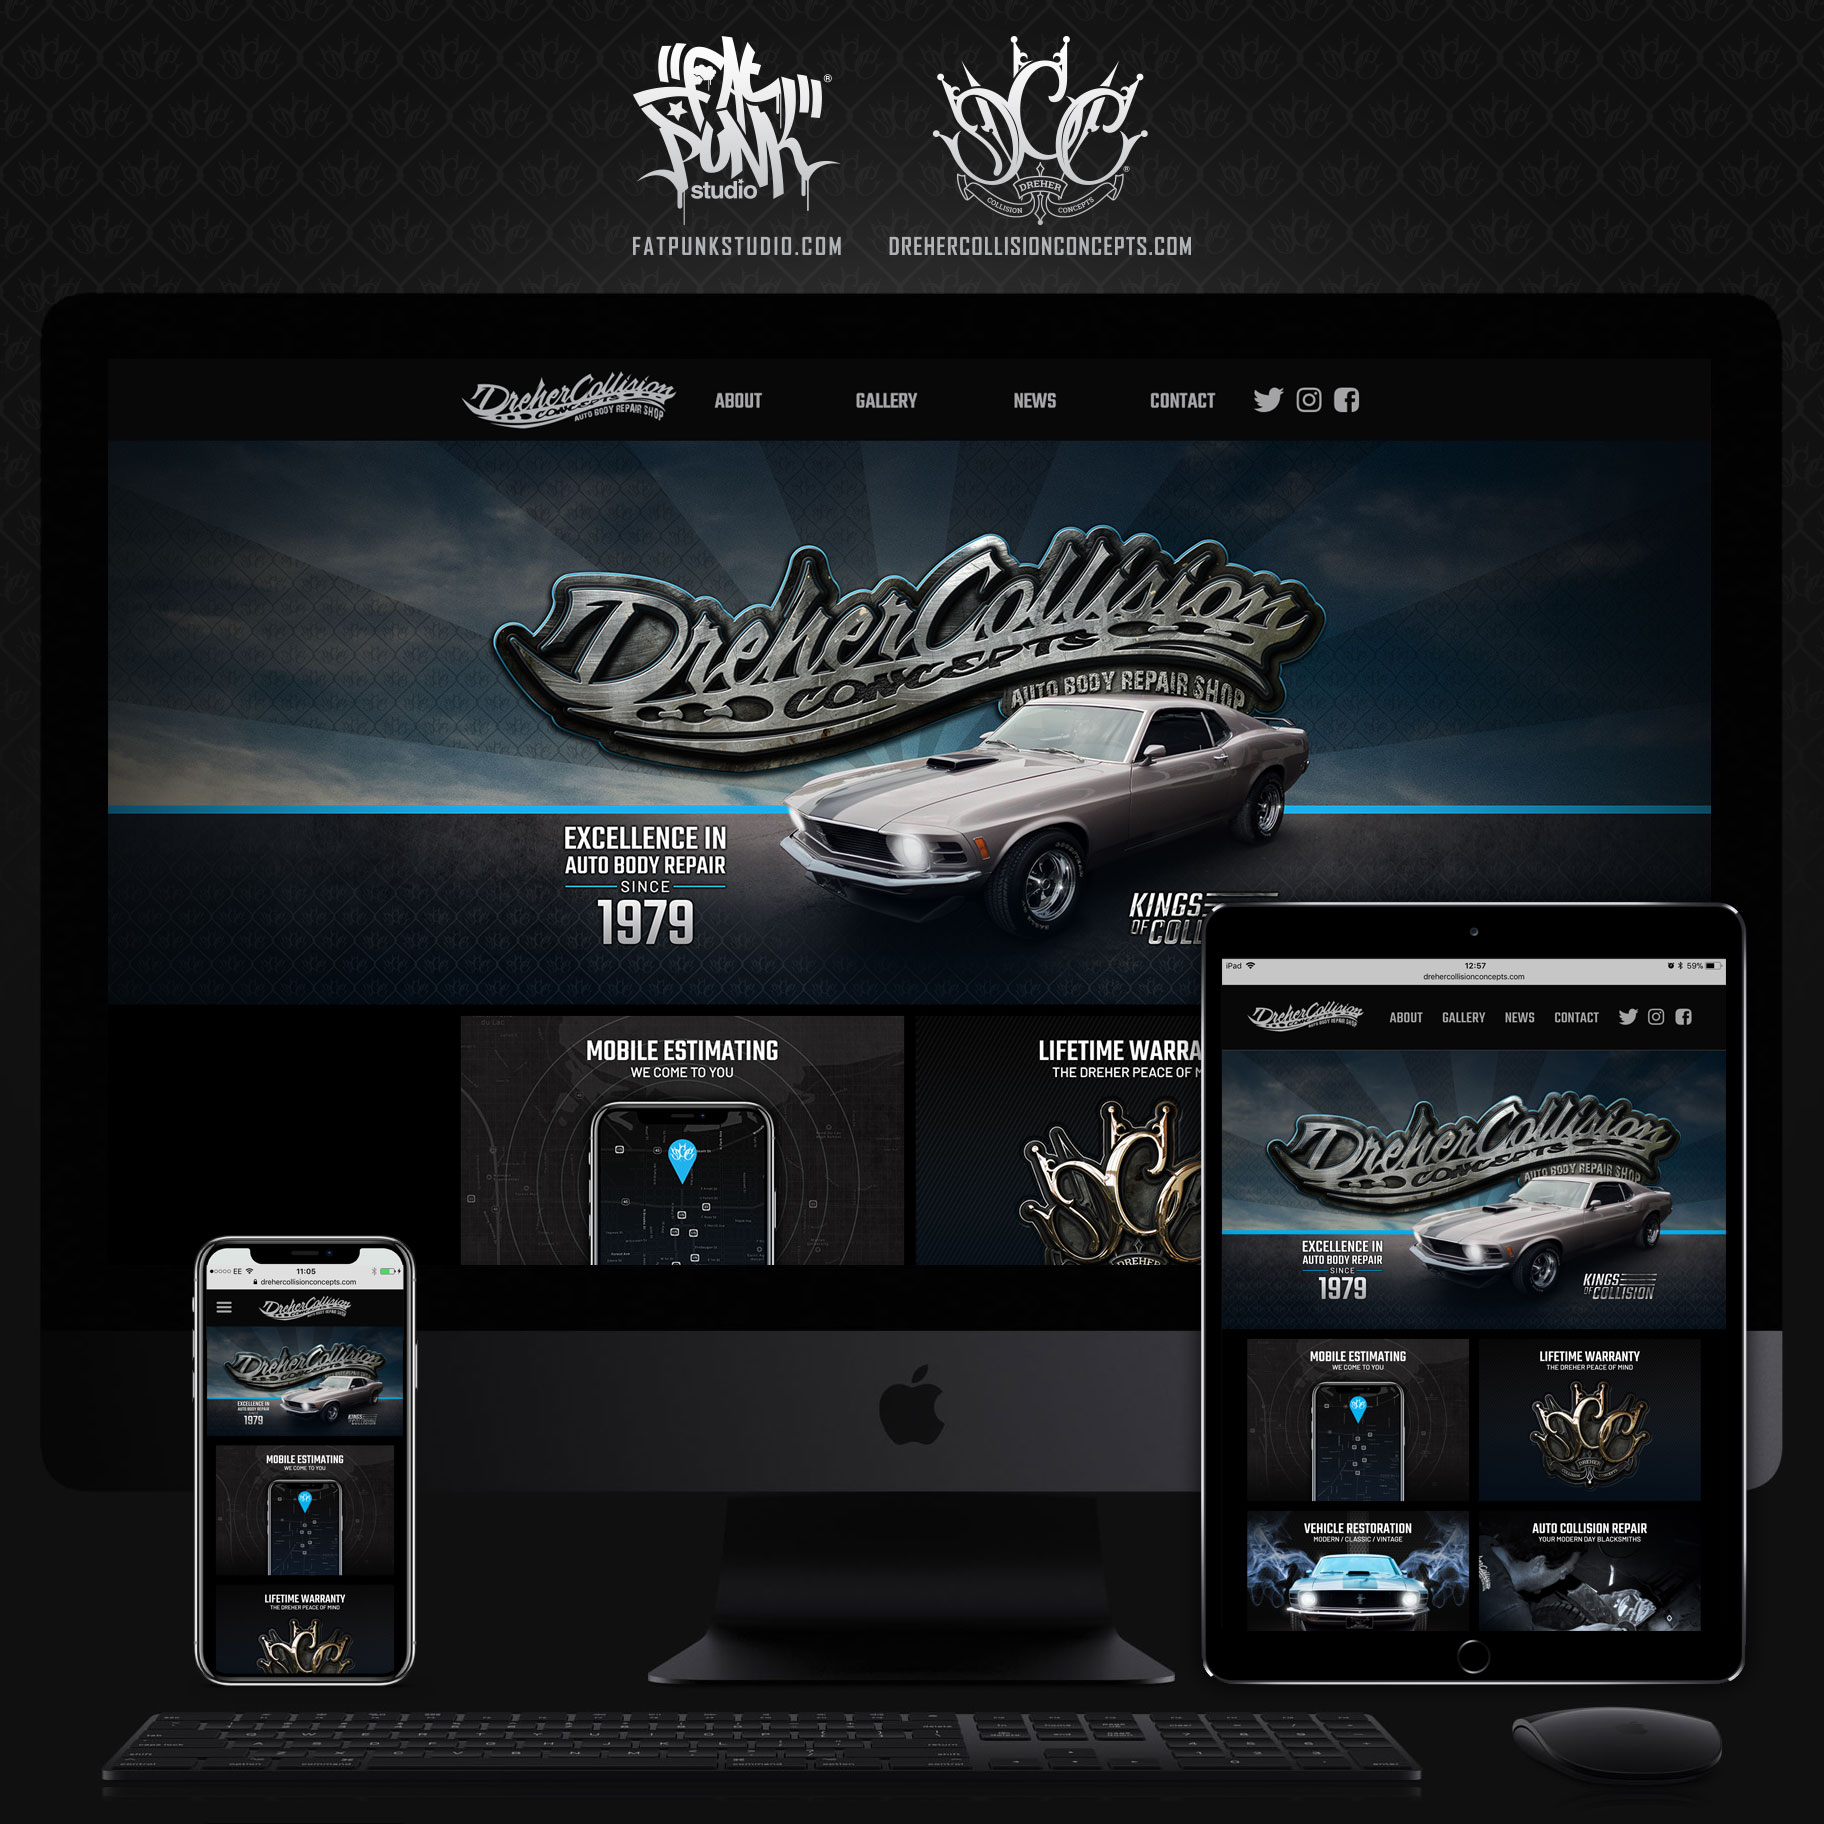 dreher-collision-concepts-new-website-launch-02